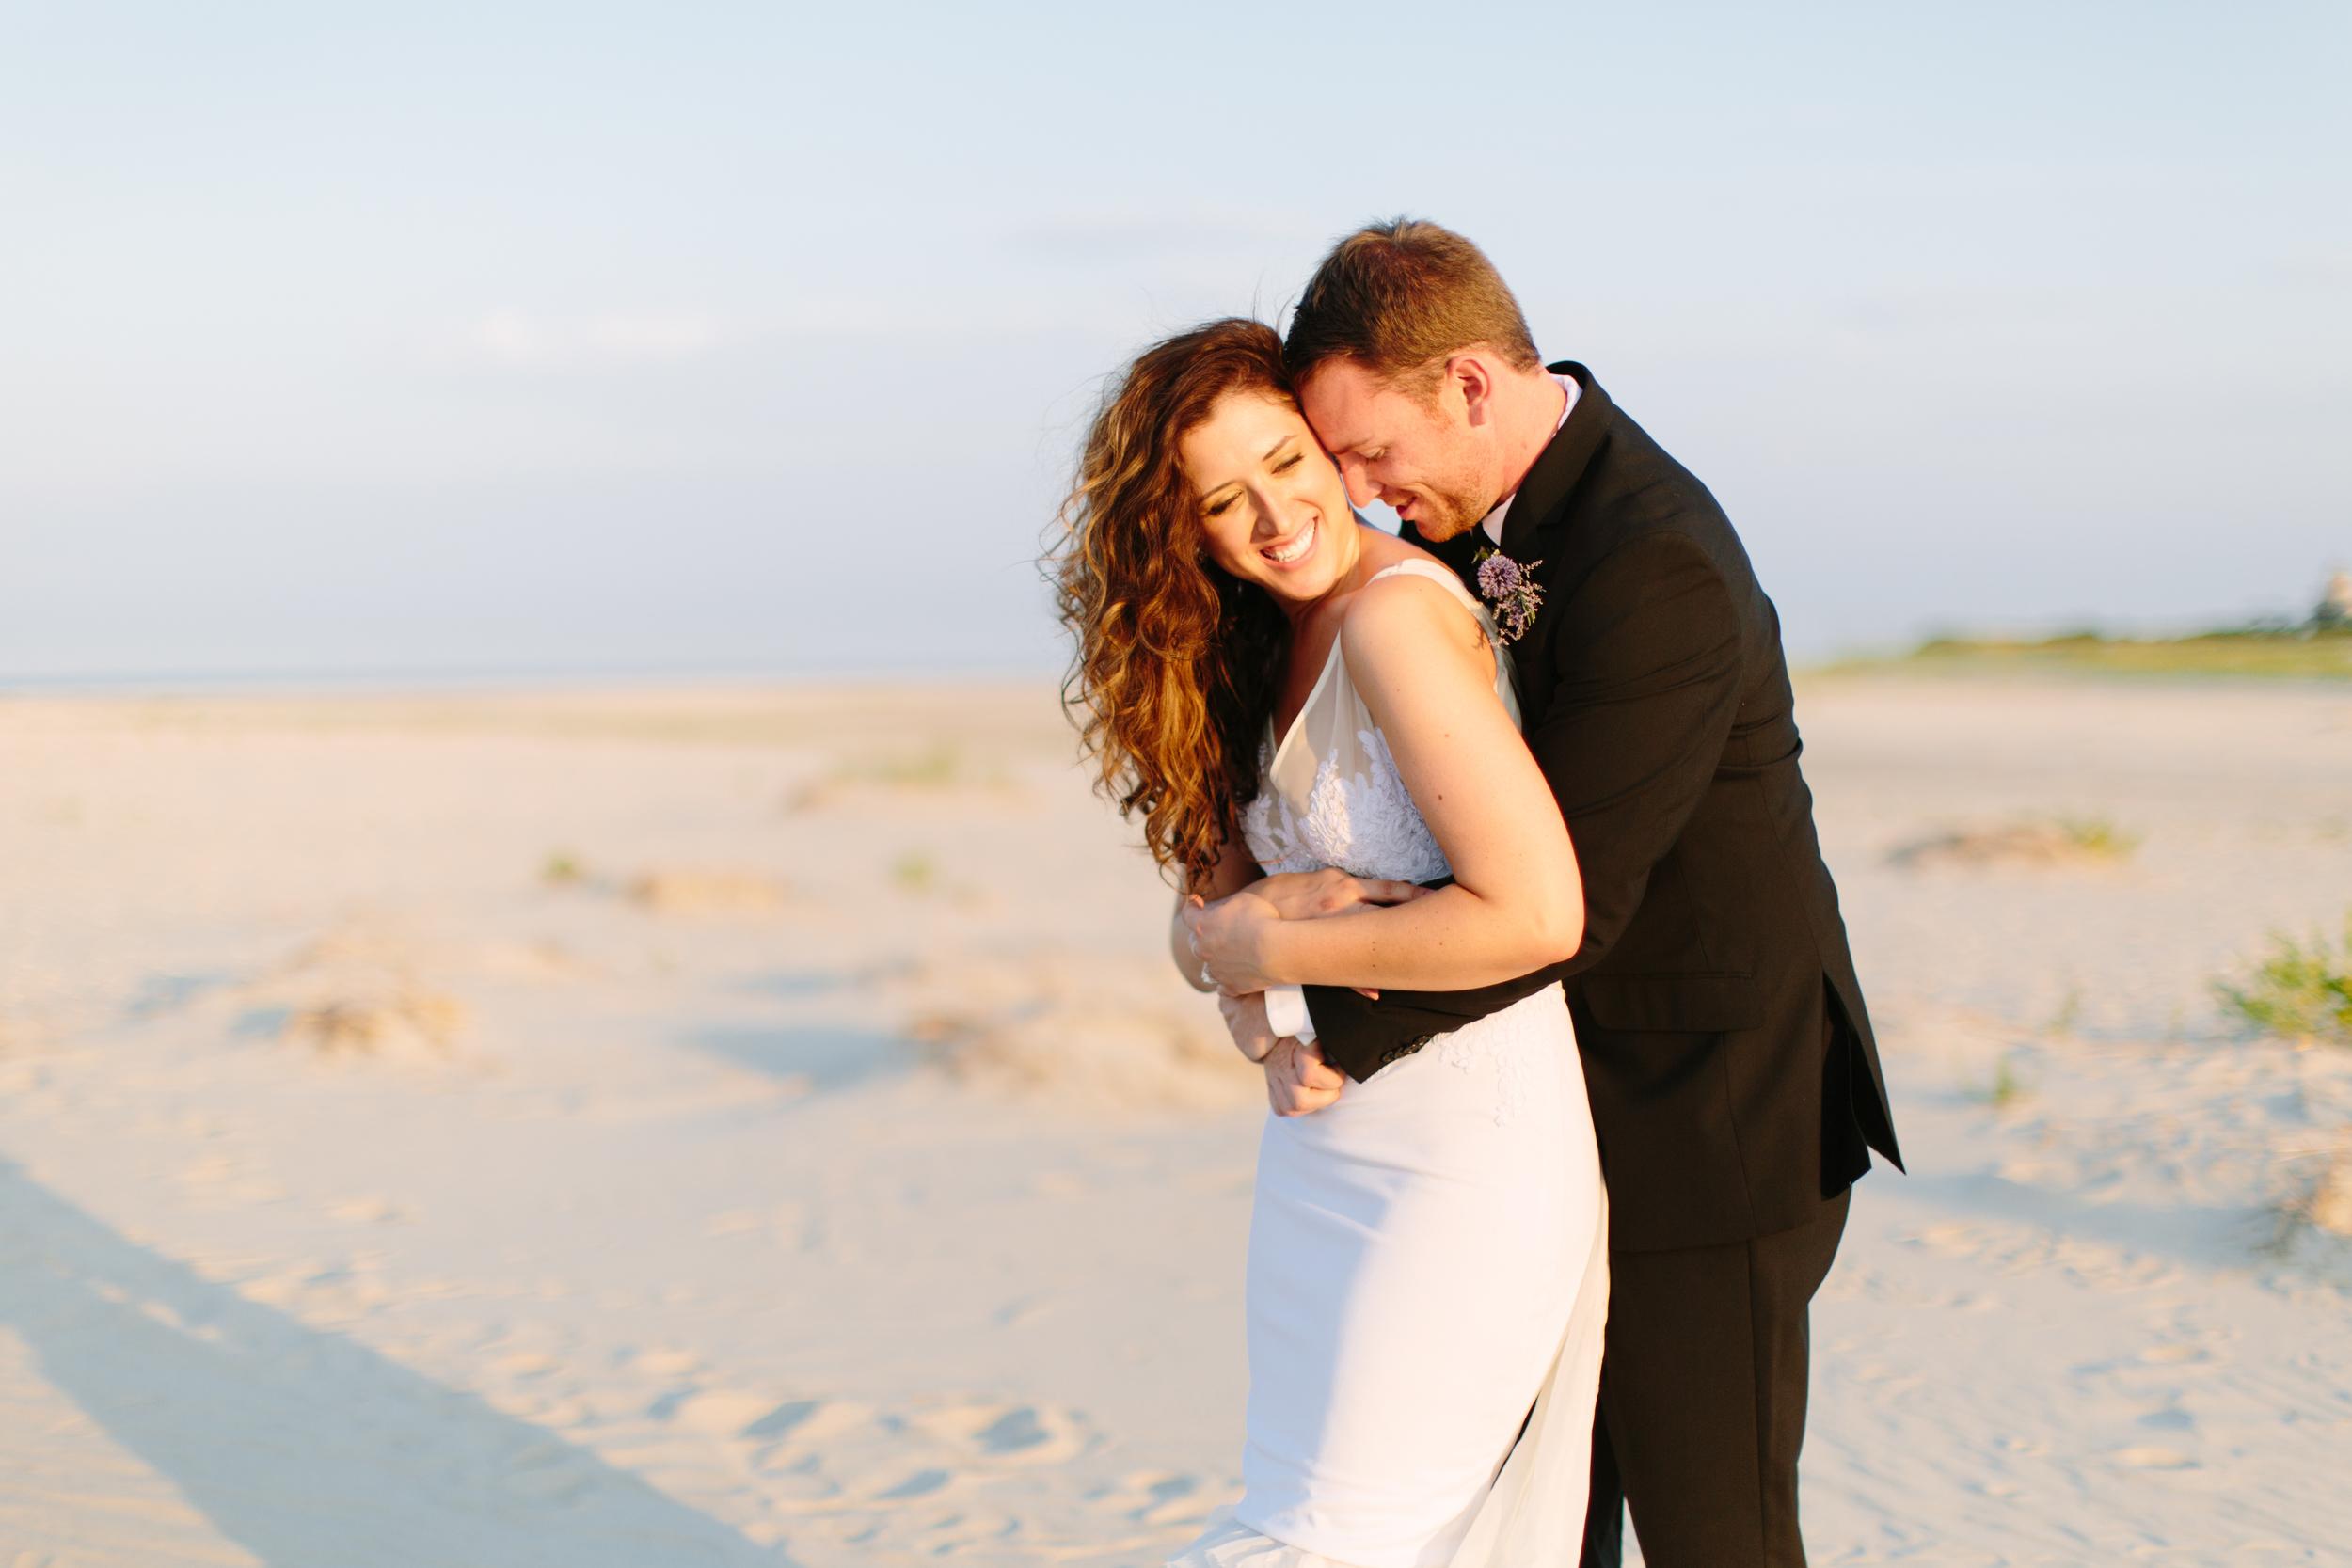 New-Jersey-Wedding-Photographer_Jessica-Cooper-Photography-21.jpg